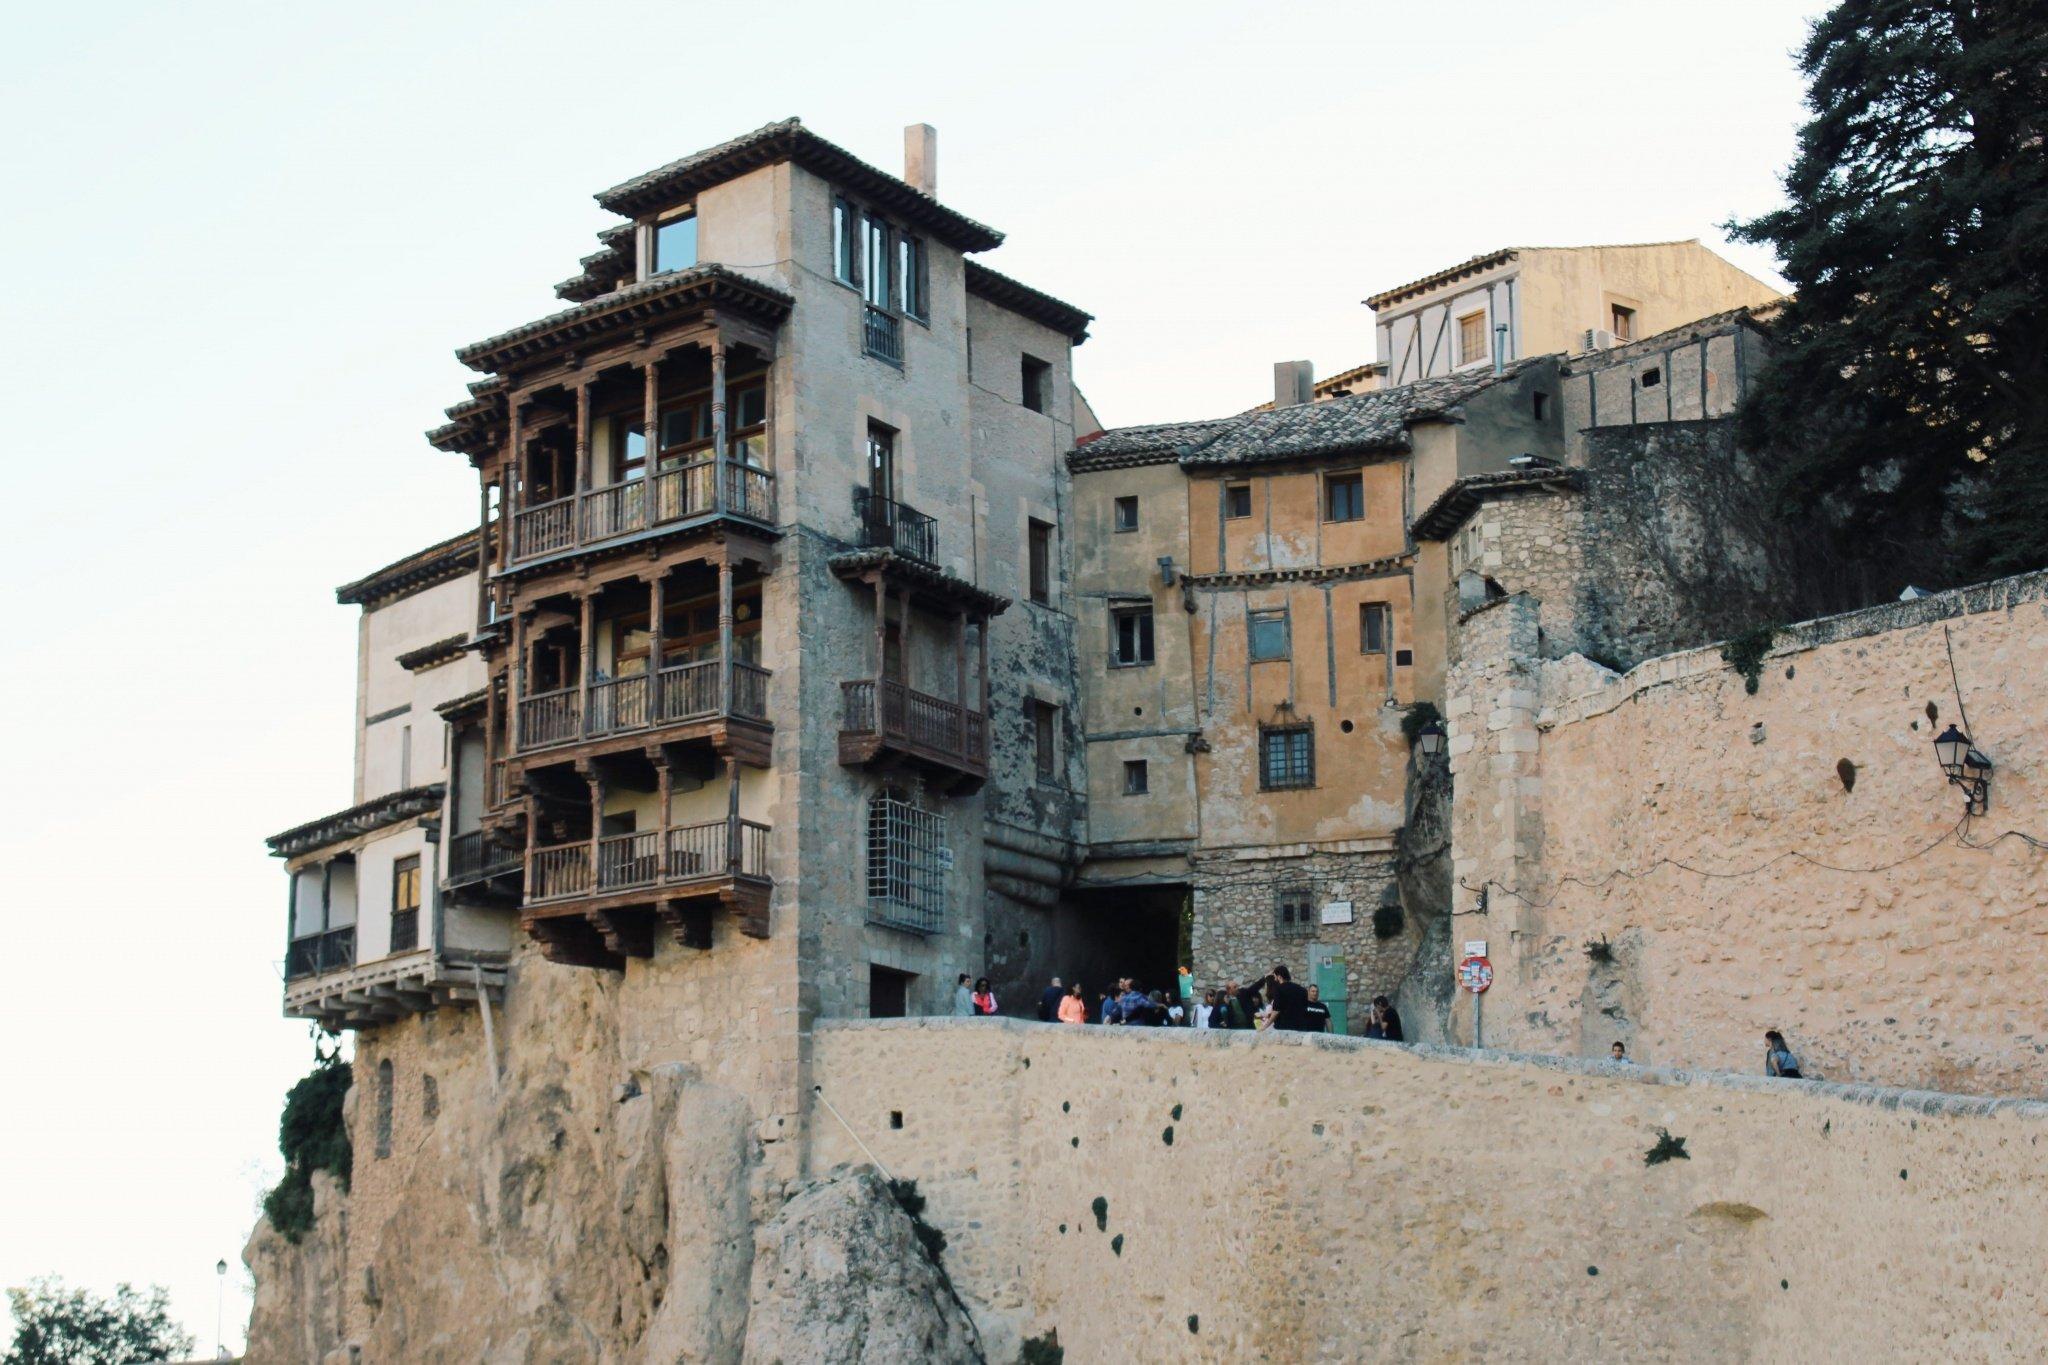 Undiscovered Spain : 5 Must See in Cuenca